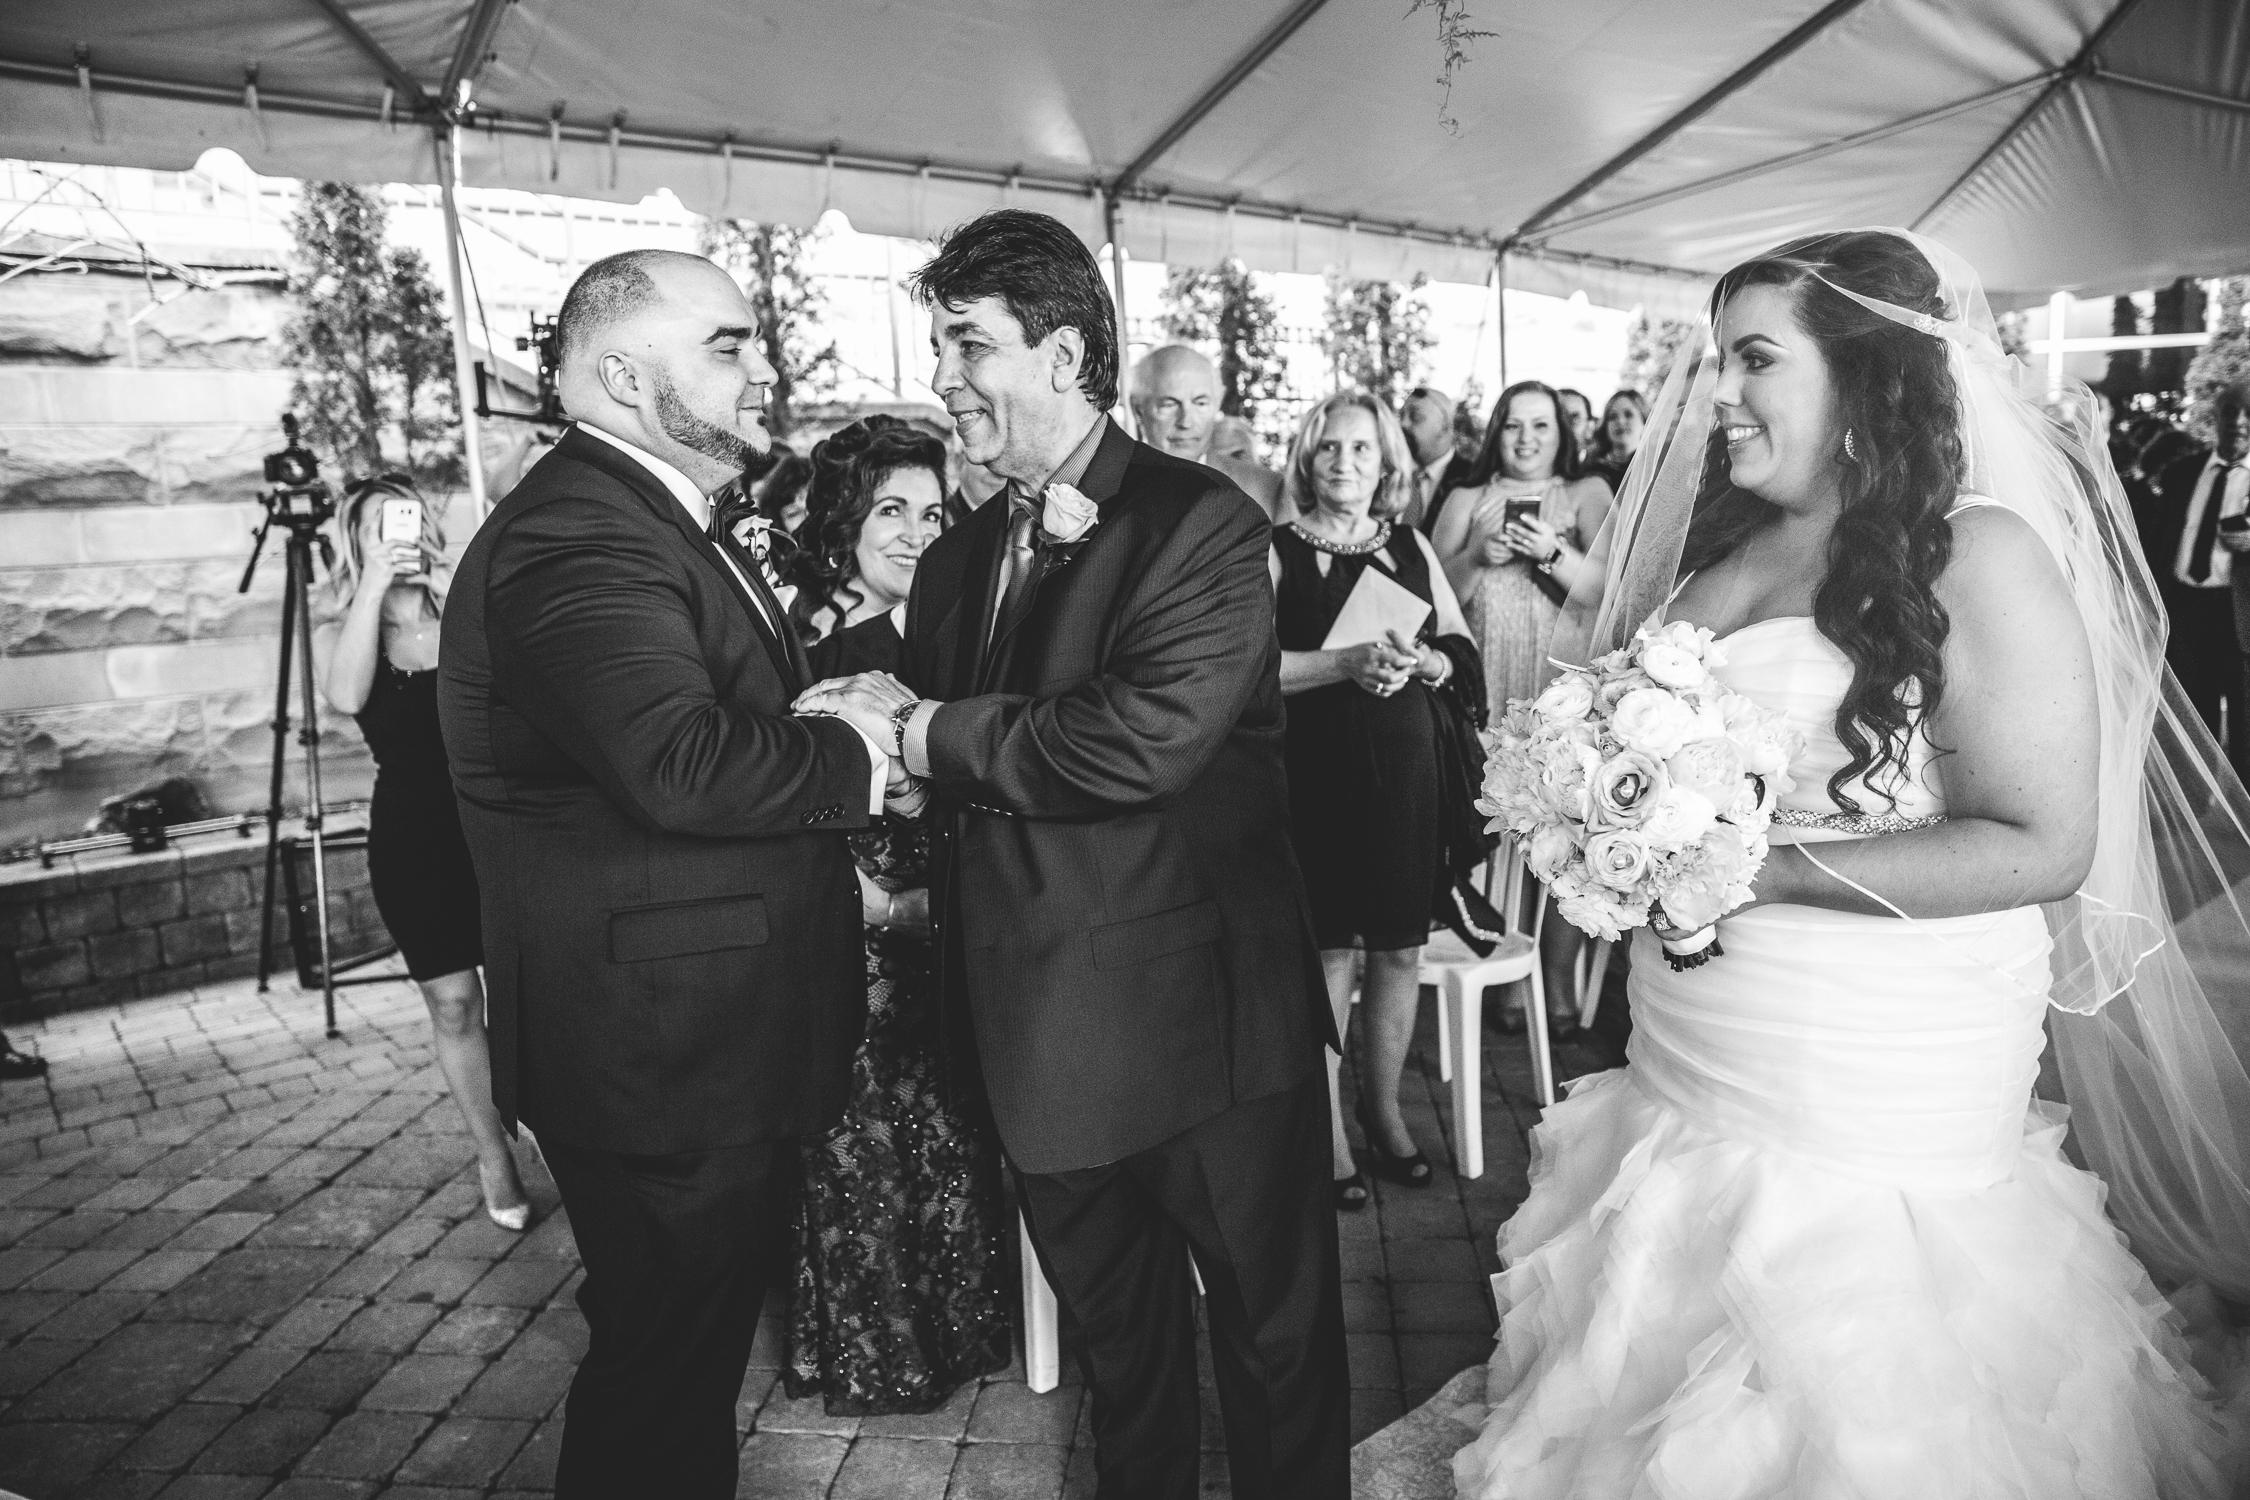 Peter-and-Marie-Wedding-Fontana-Primavera-Graydon-Hall-Manor-Toronto-Ontario-Canada-0037.jpg